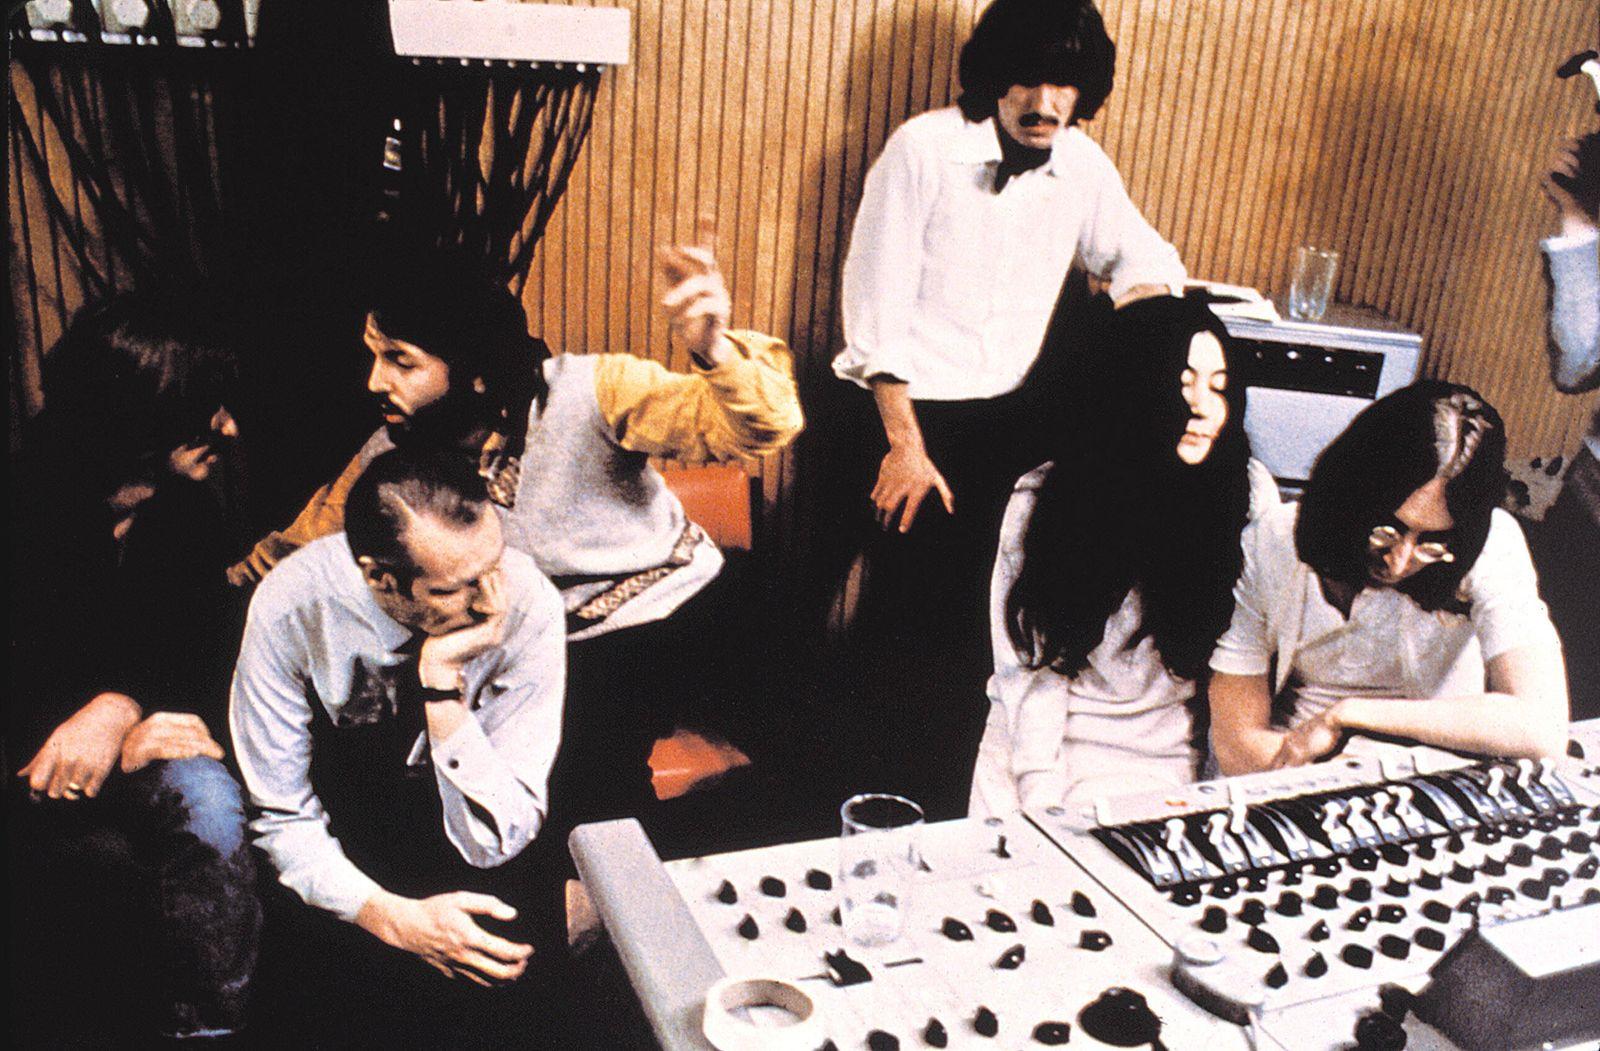 LET IT BE, (l to r) Ringo Starr, George Martin, Paul McCartney, George Harrison, Yoko Ono, John Lennon, 1970 Courtesy Ev